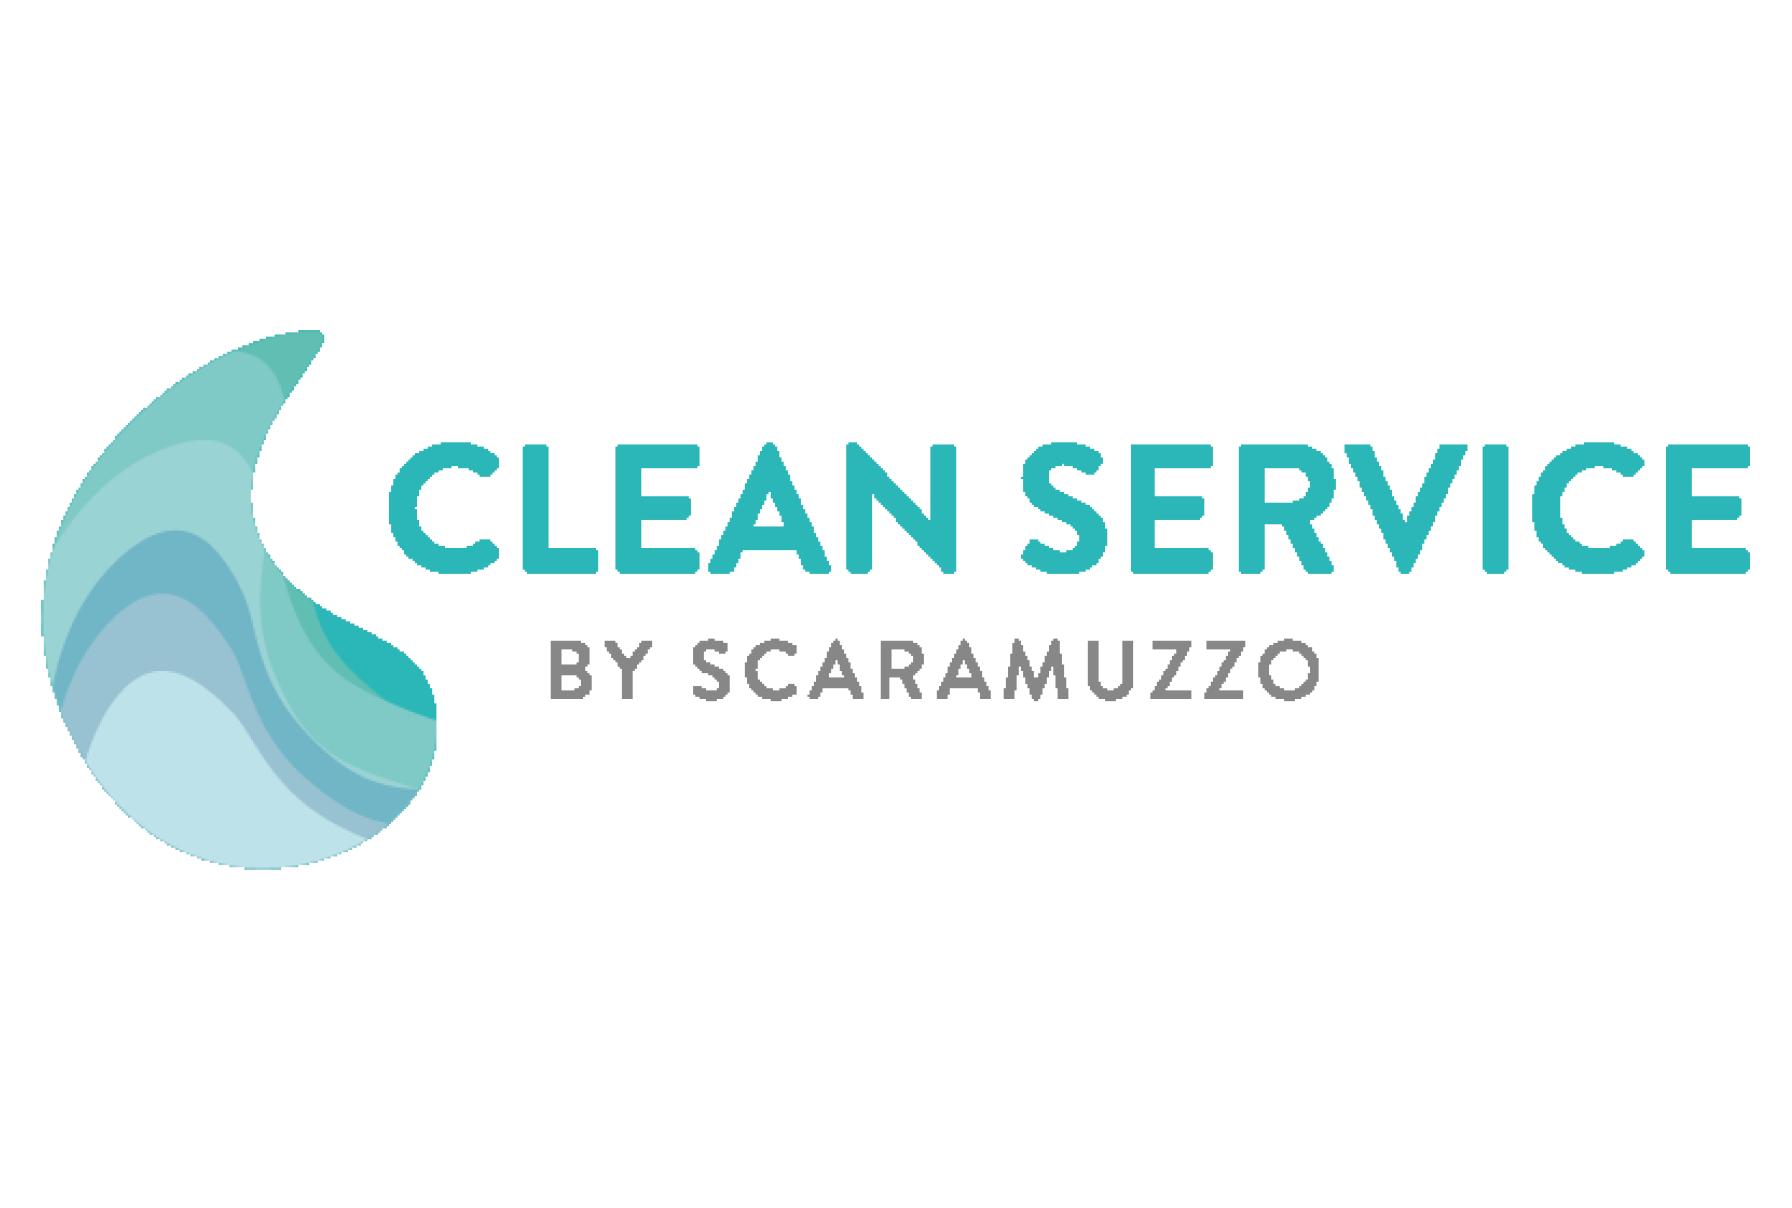 Clean Service - by Scaramuzzo